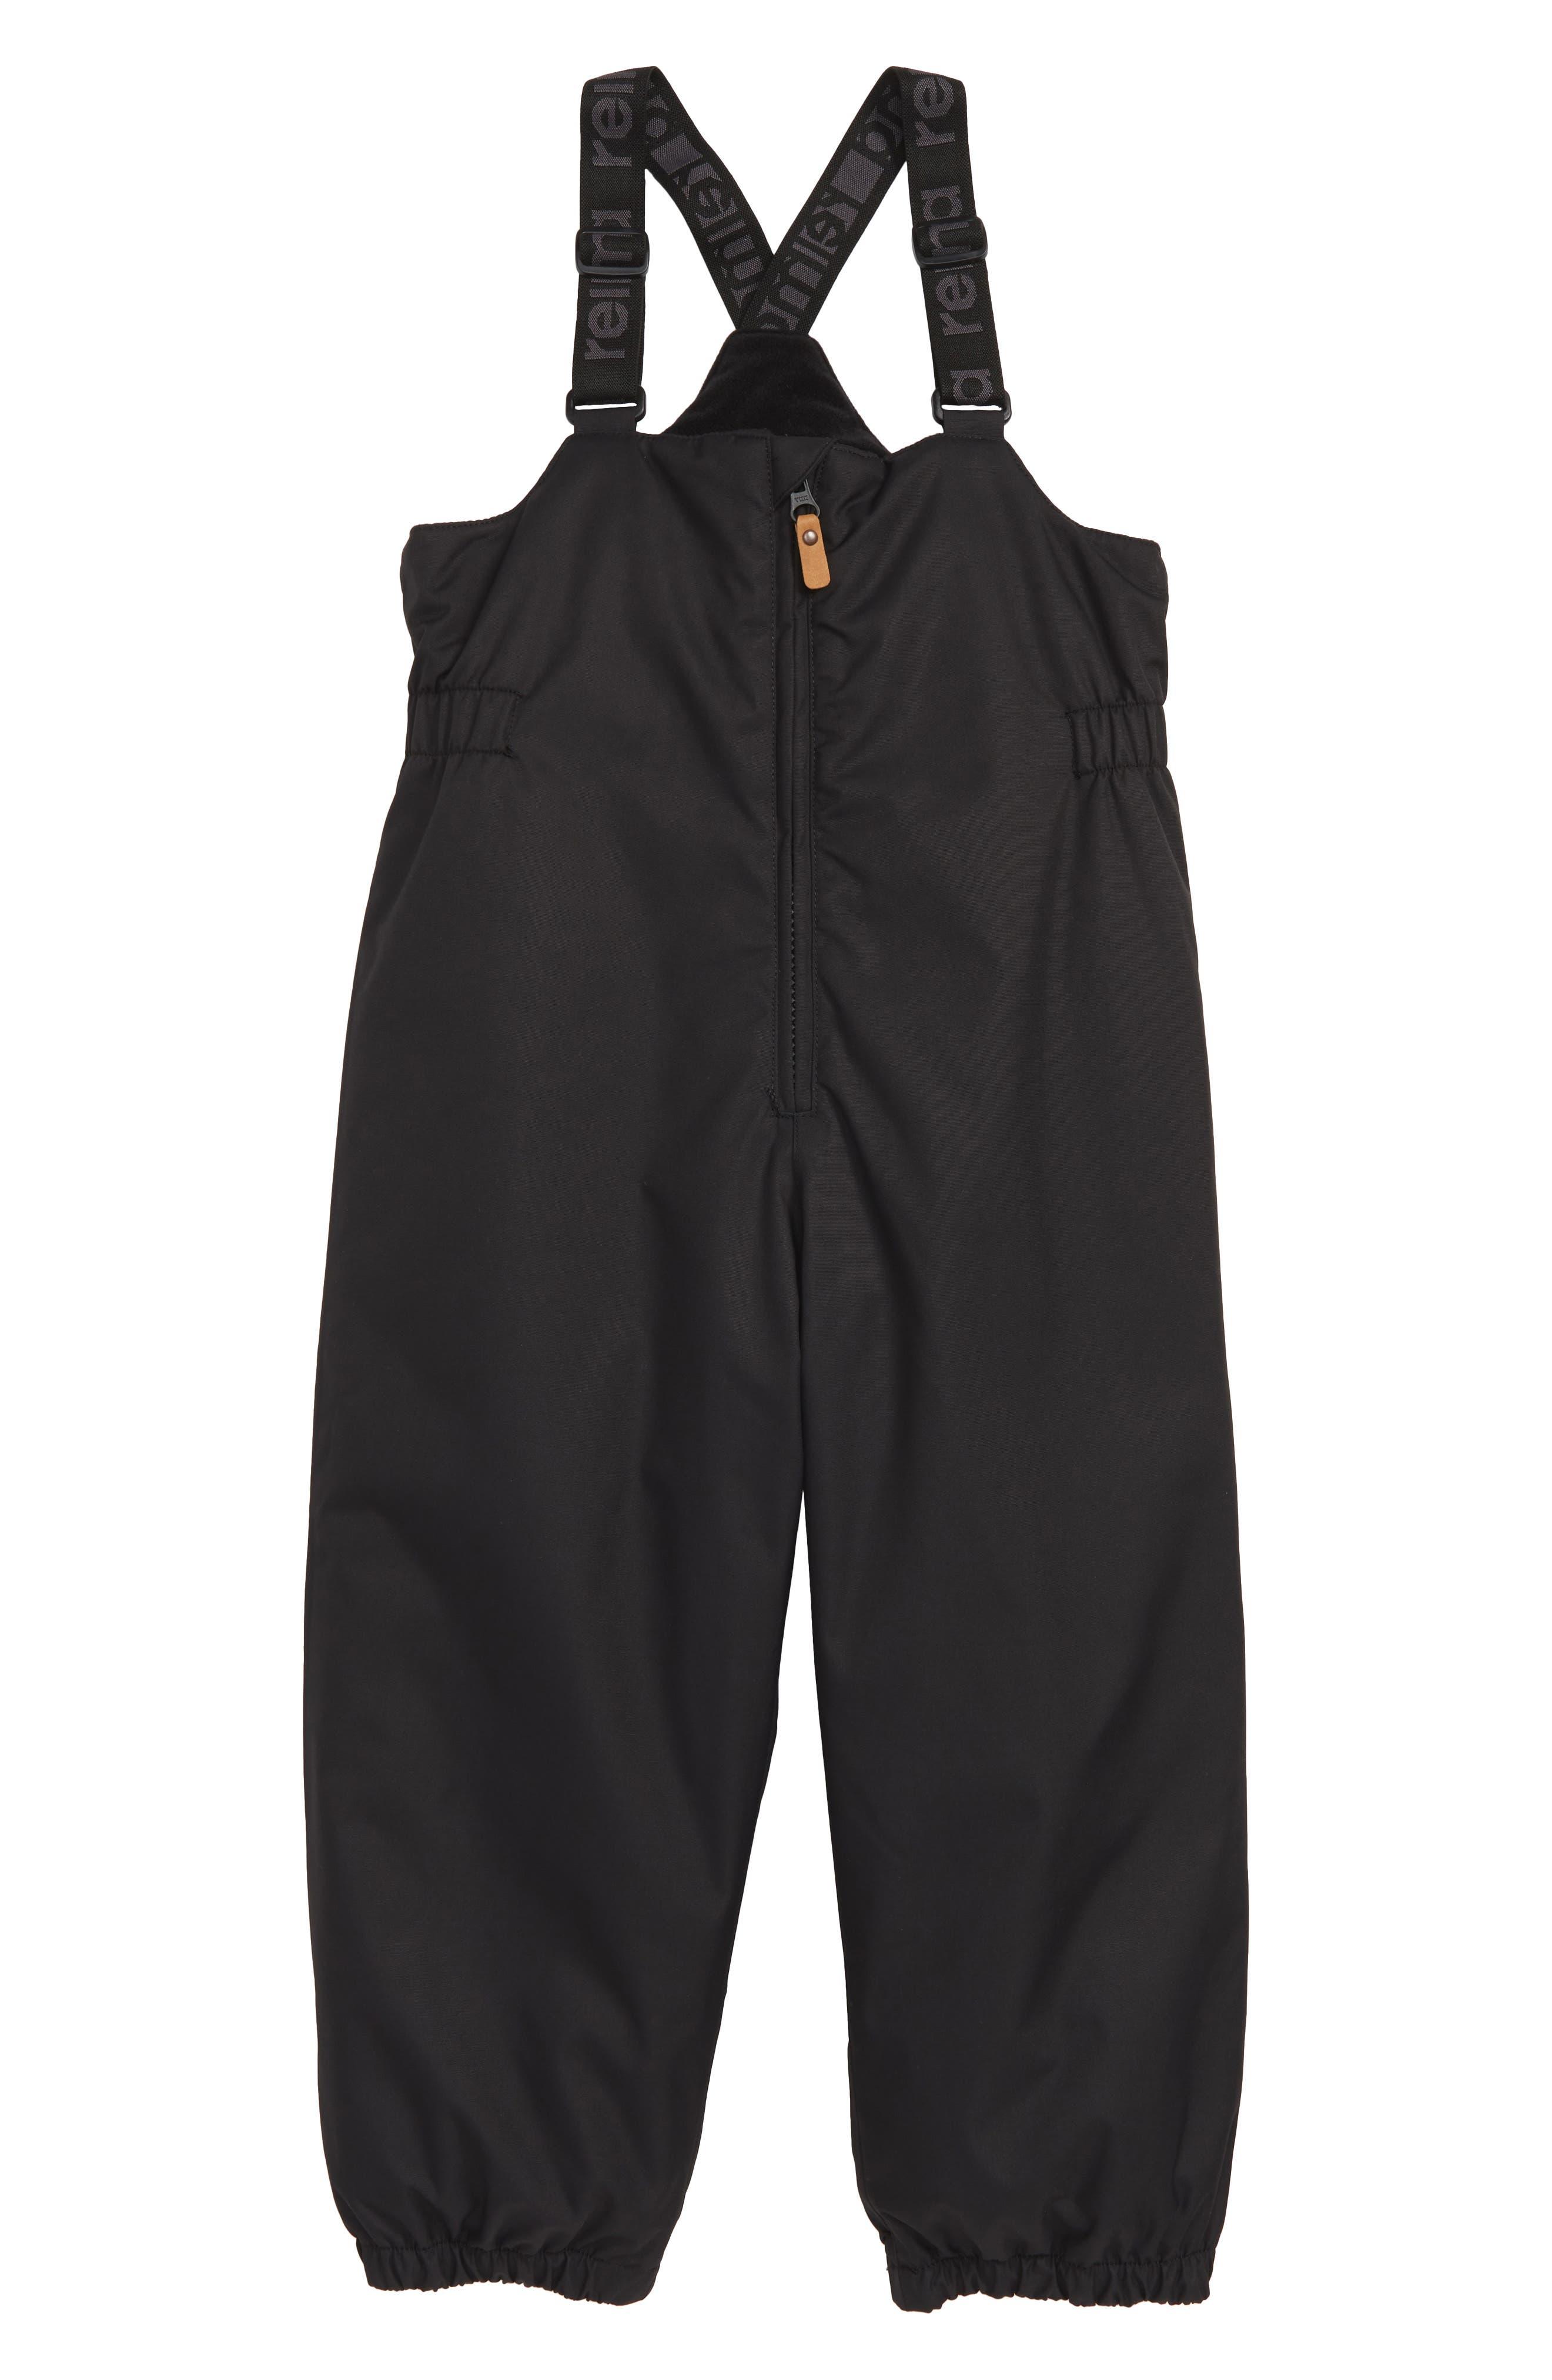 Boys Reima Matias Reimatec Waterproof  Windproof Insulated Snow Pants Size 5Y  110 cm  Black